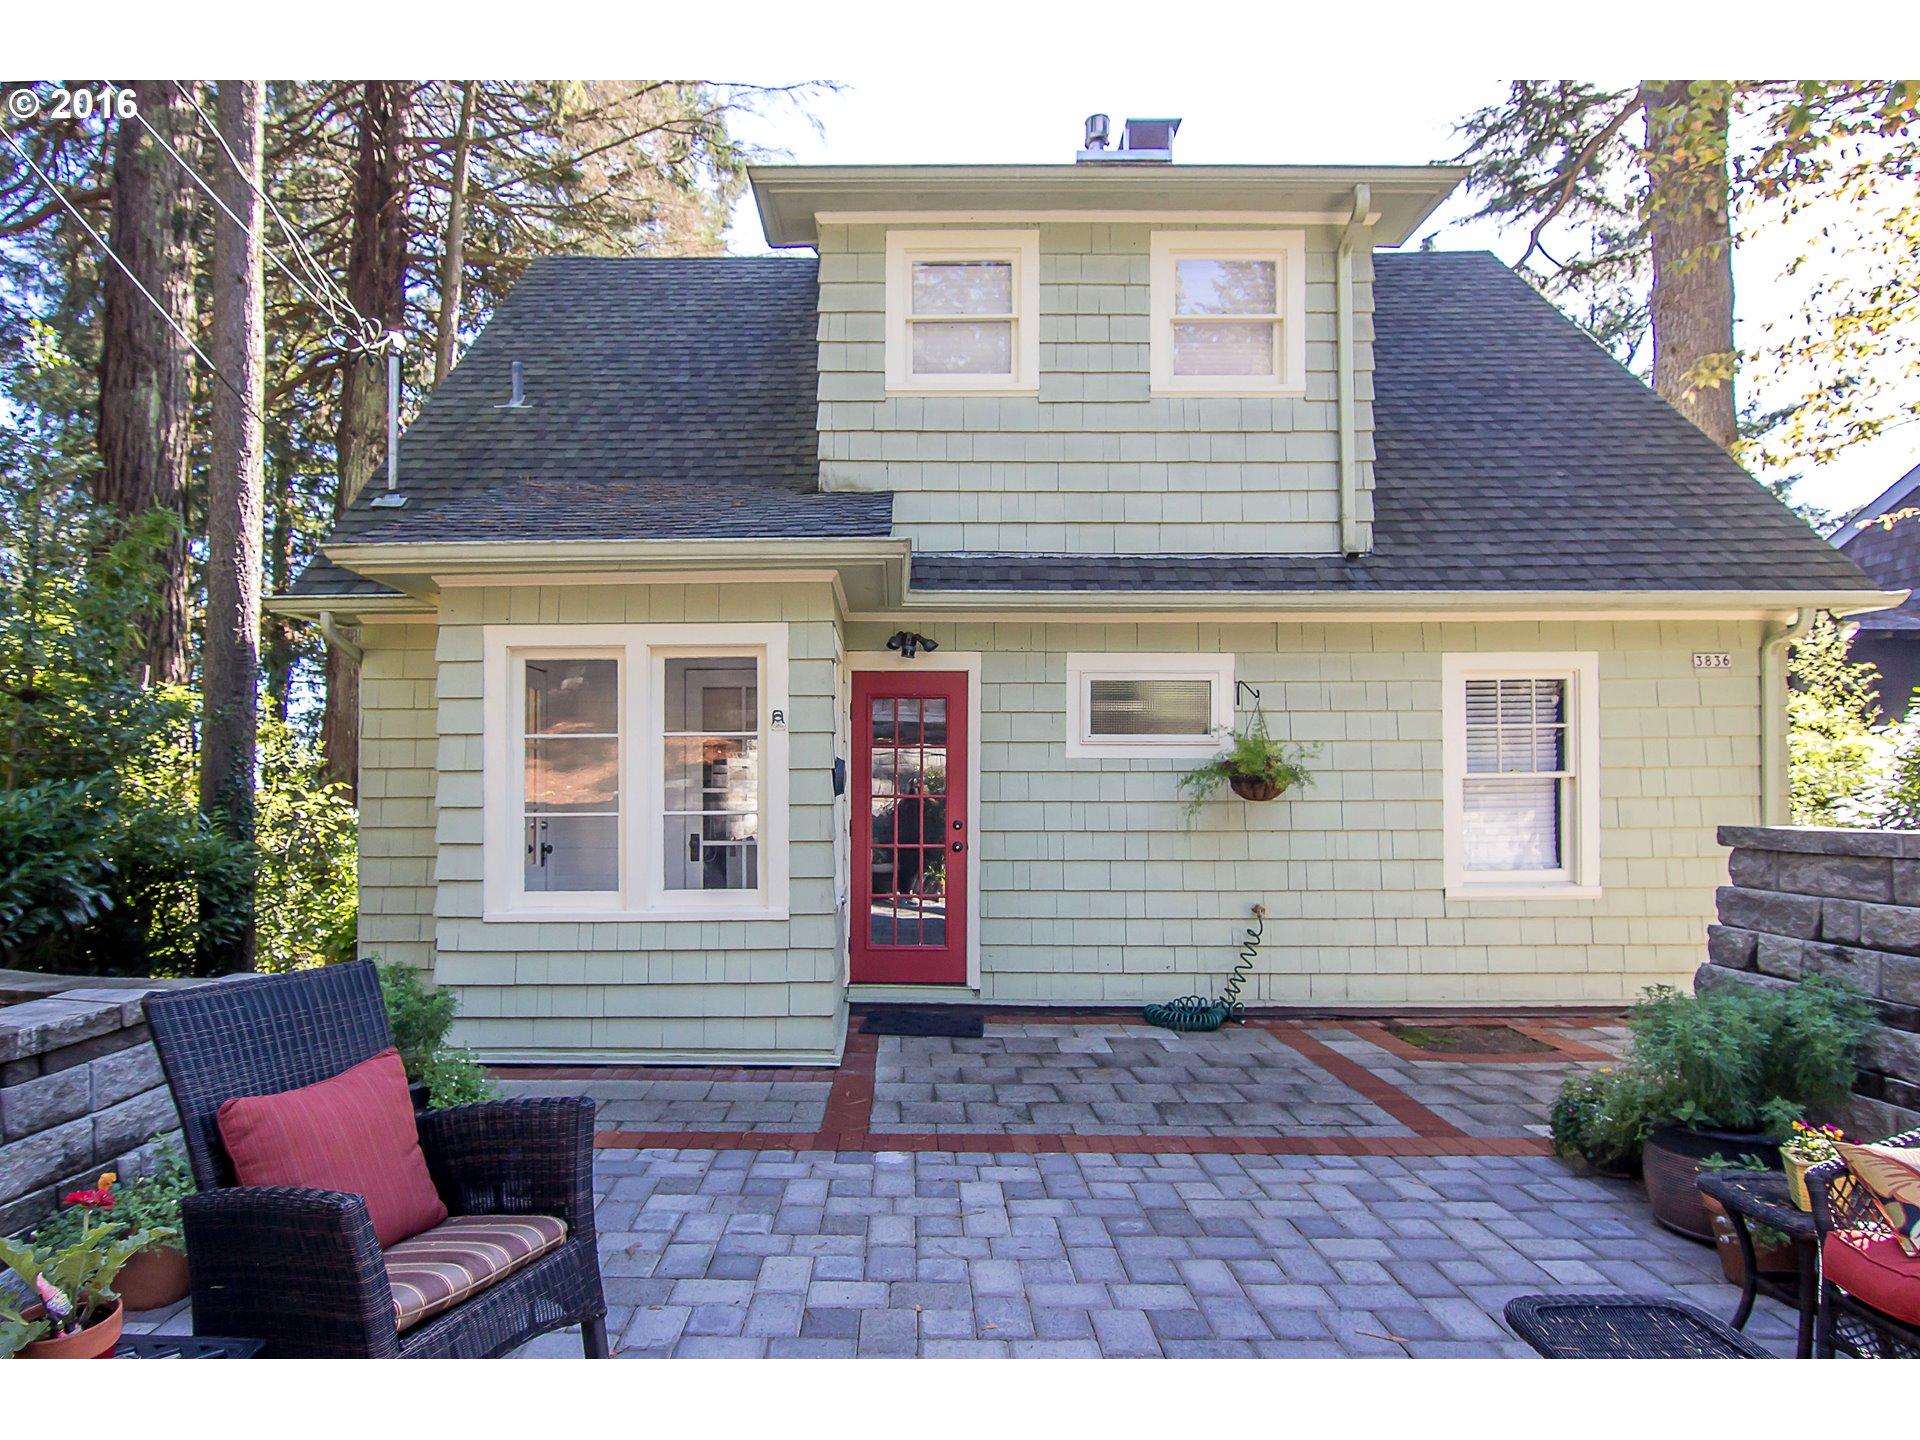 3836 Sw Hewett Blvd Portland Or 97221 Living Room Realty Portland Real Estate